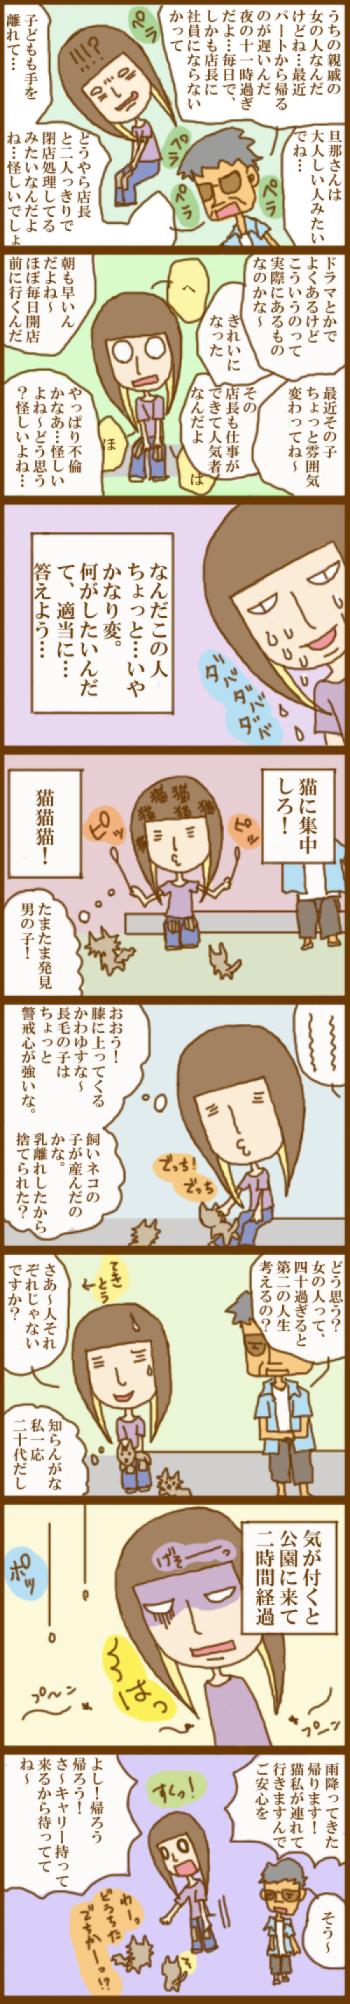 f:id:suzuokayu:20201120095141j:plain